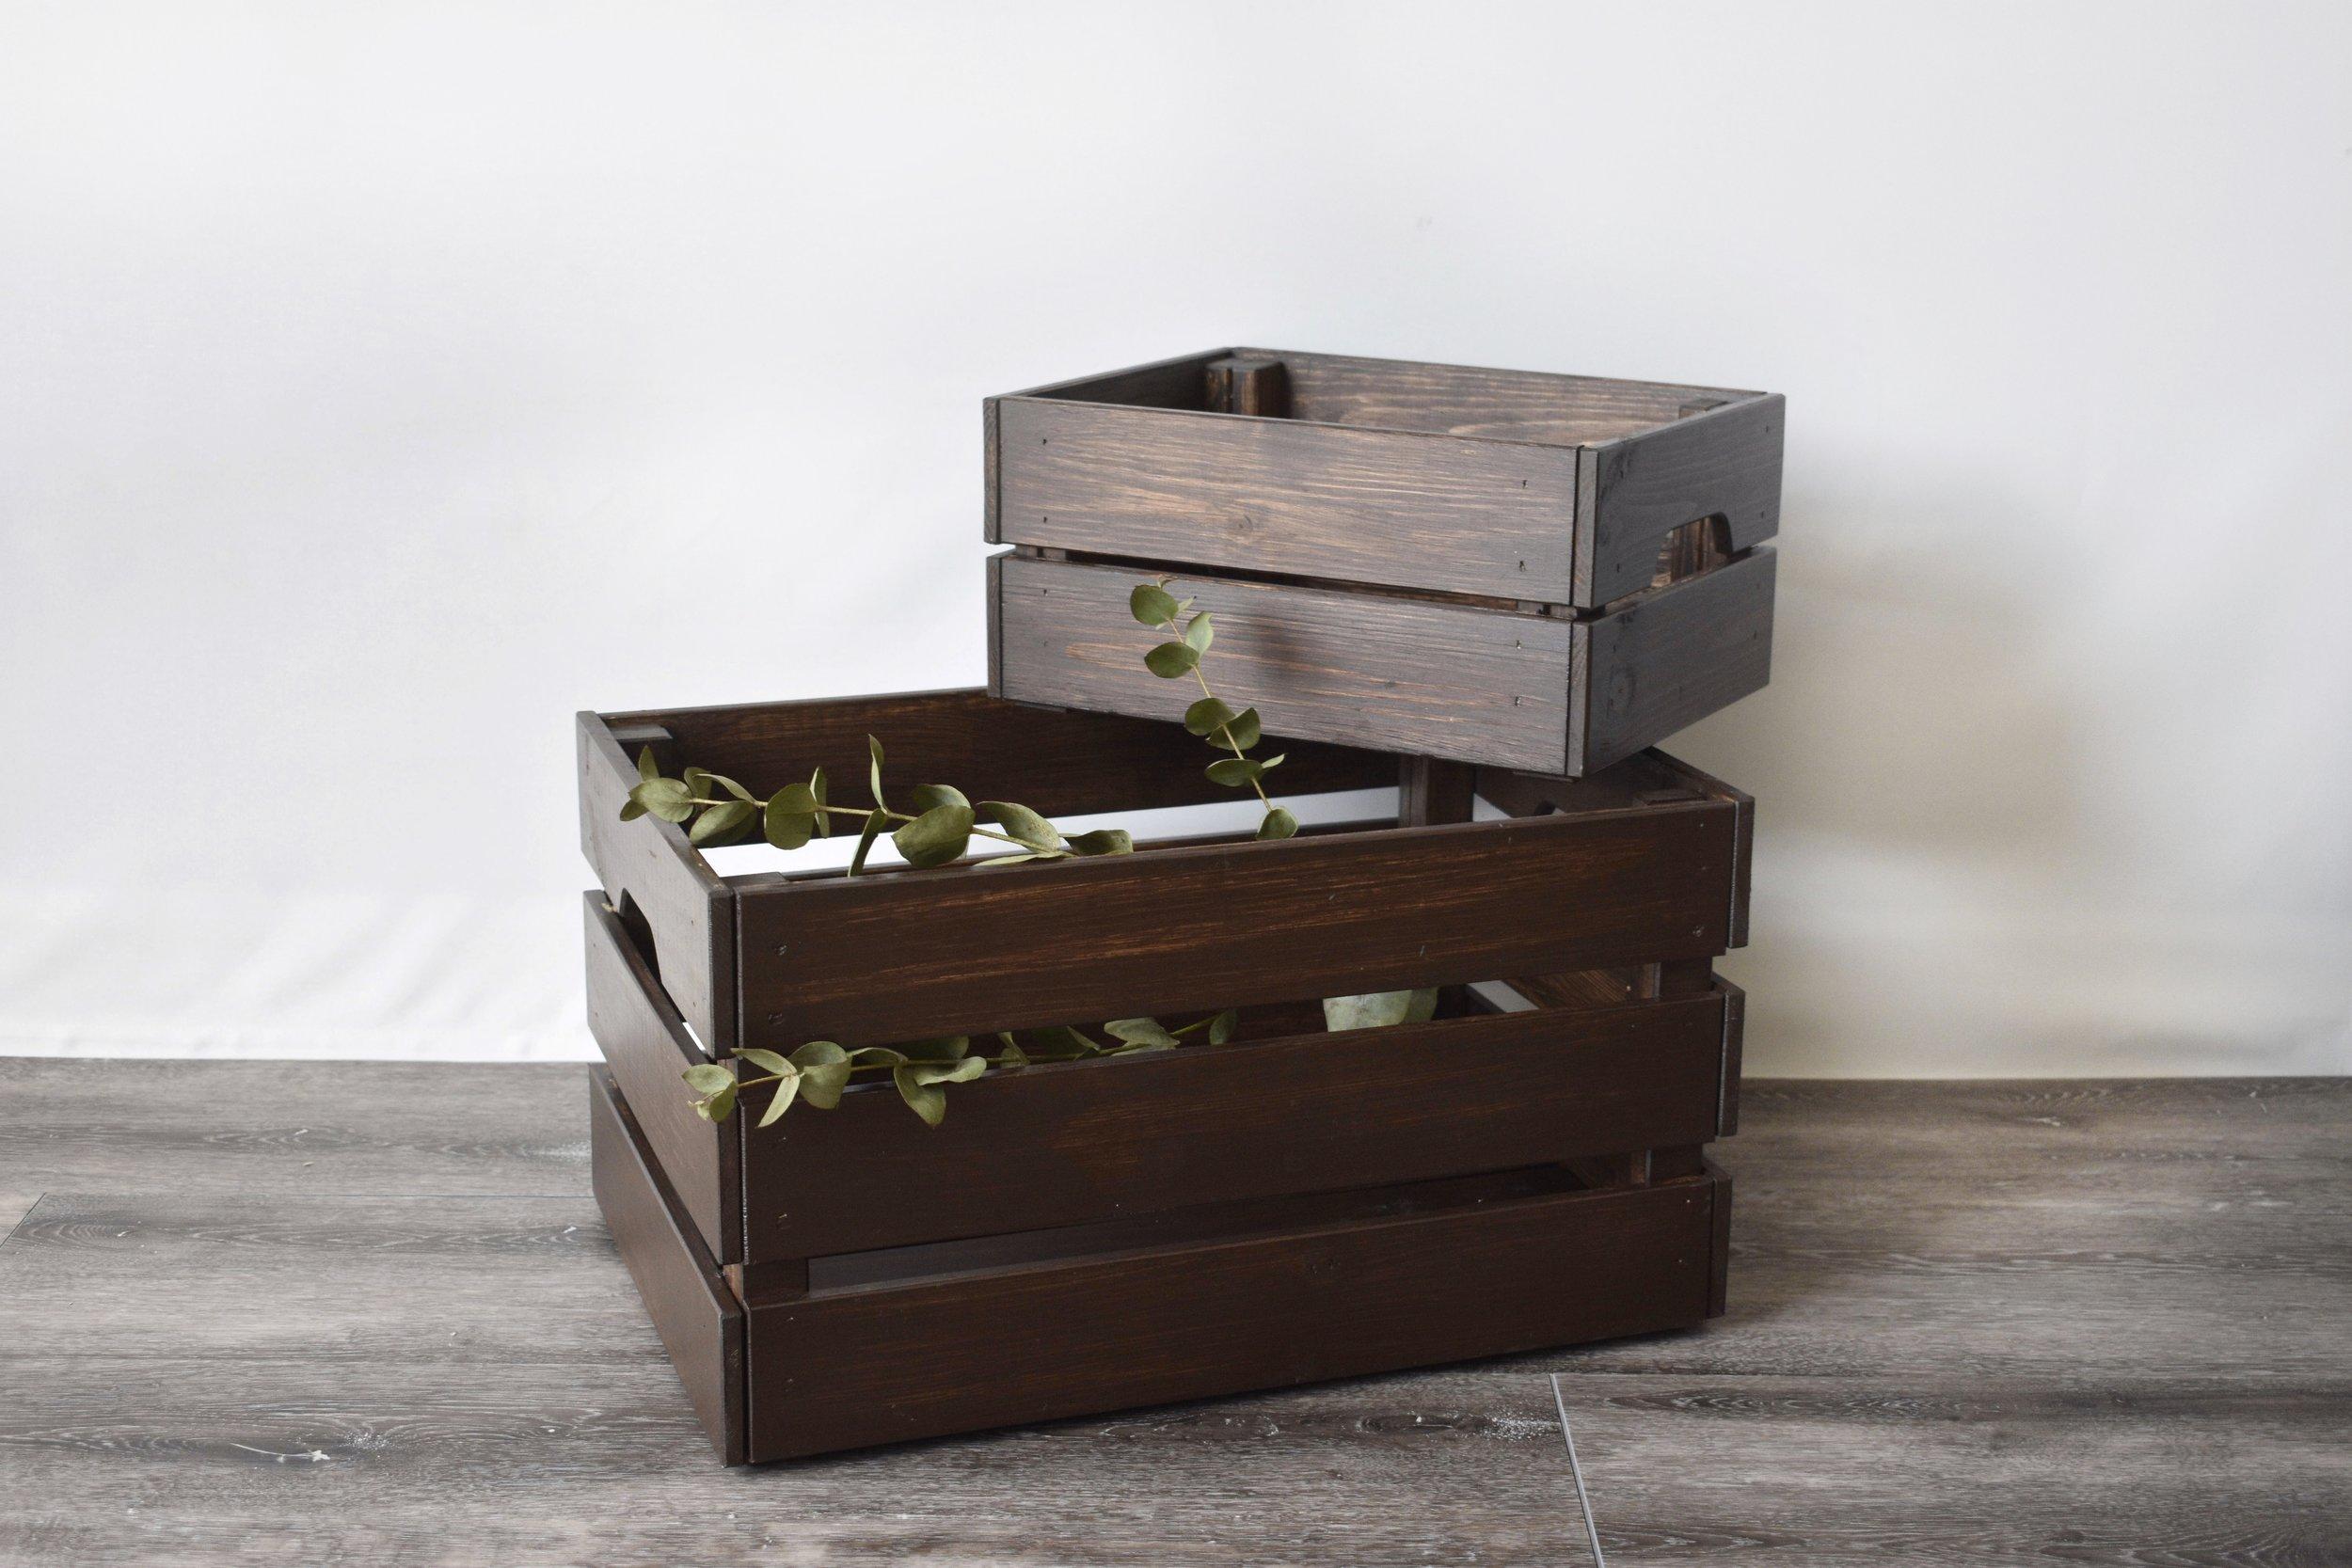 Mixed Wooden Crates